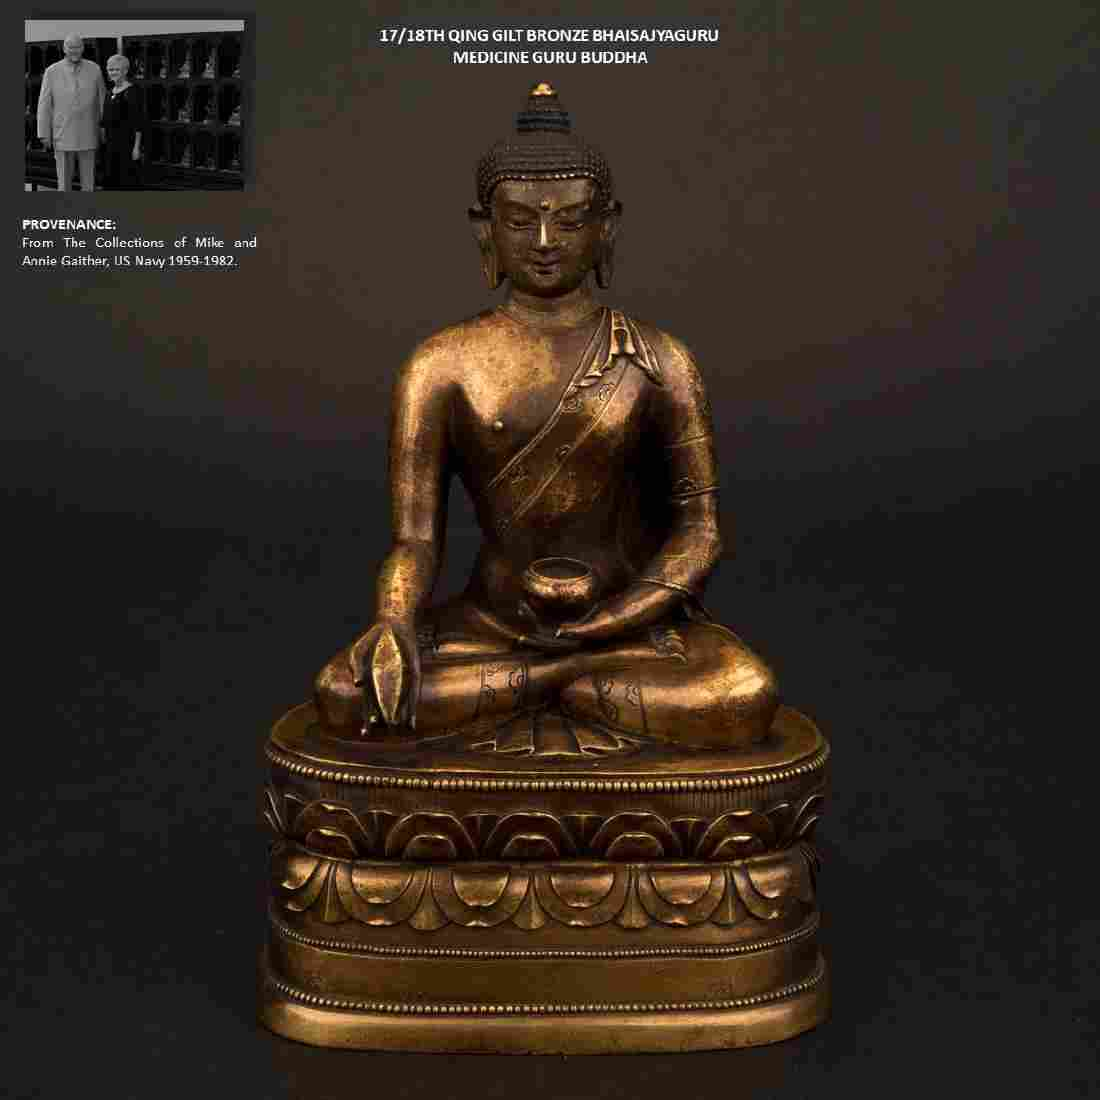 17/18TH C QING GILT BRONZE MEDICINE GURU BUDDHA